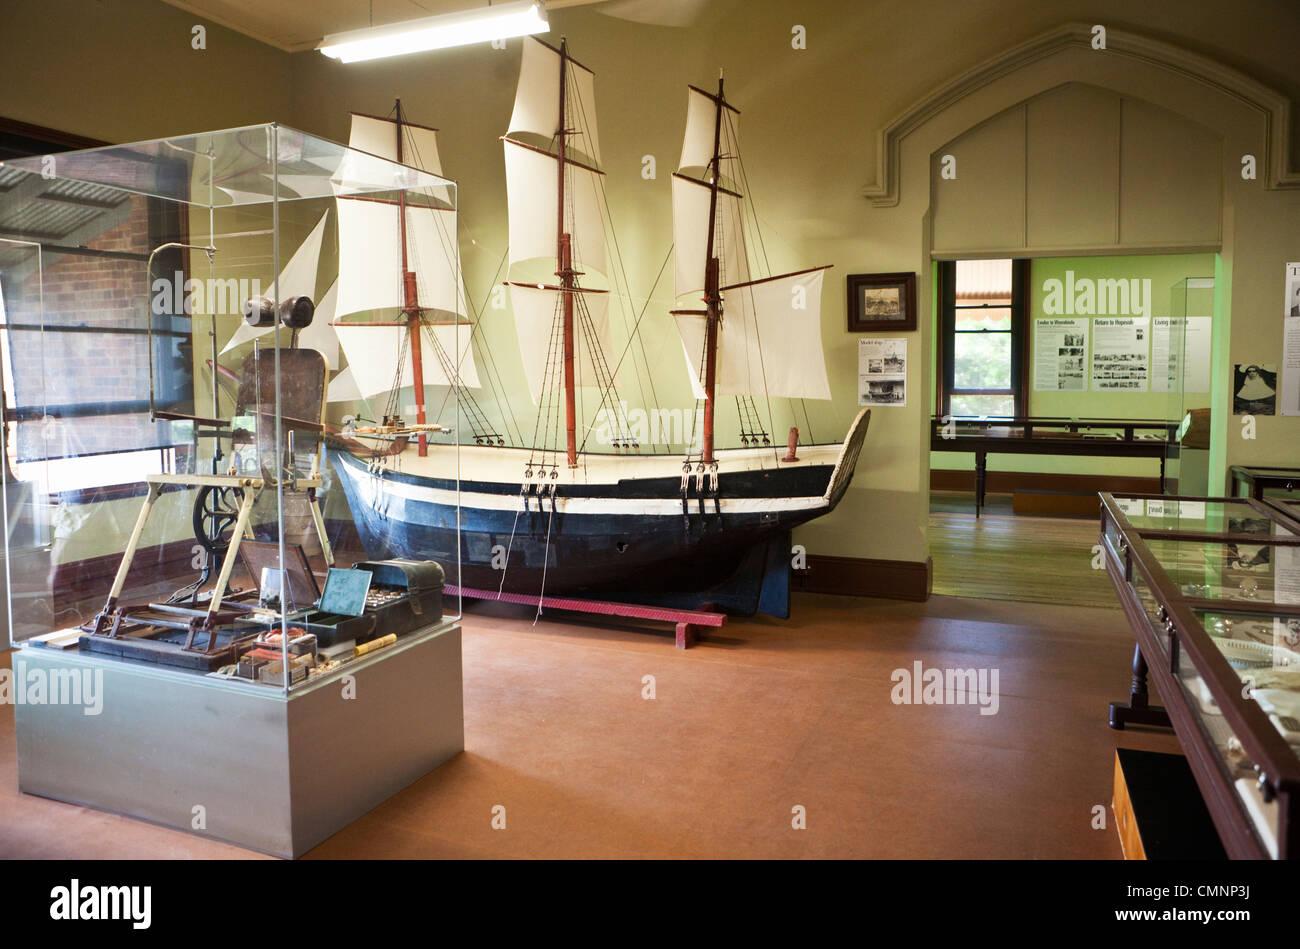 Exhibition Displays Australasia Brookvale : Exhibits in the james cook historical museum cooktown